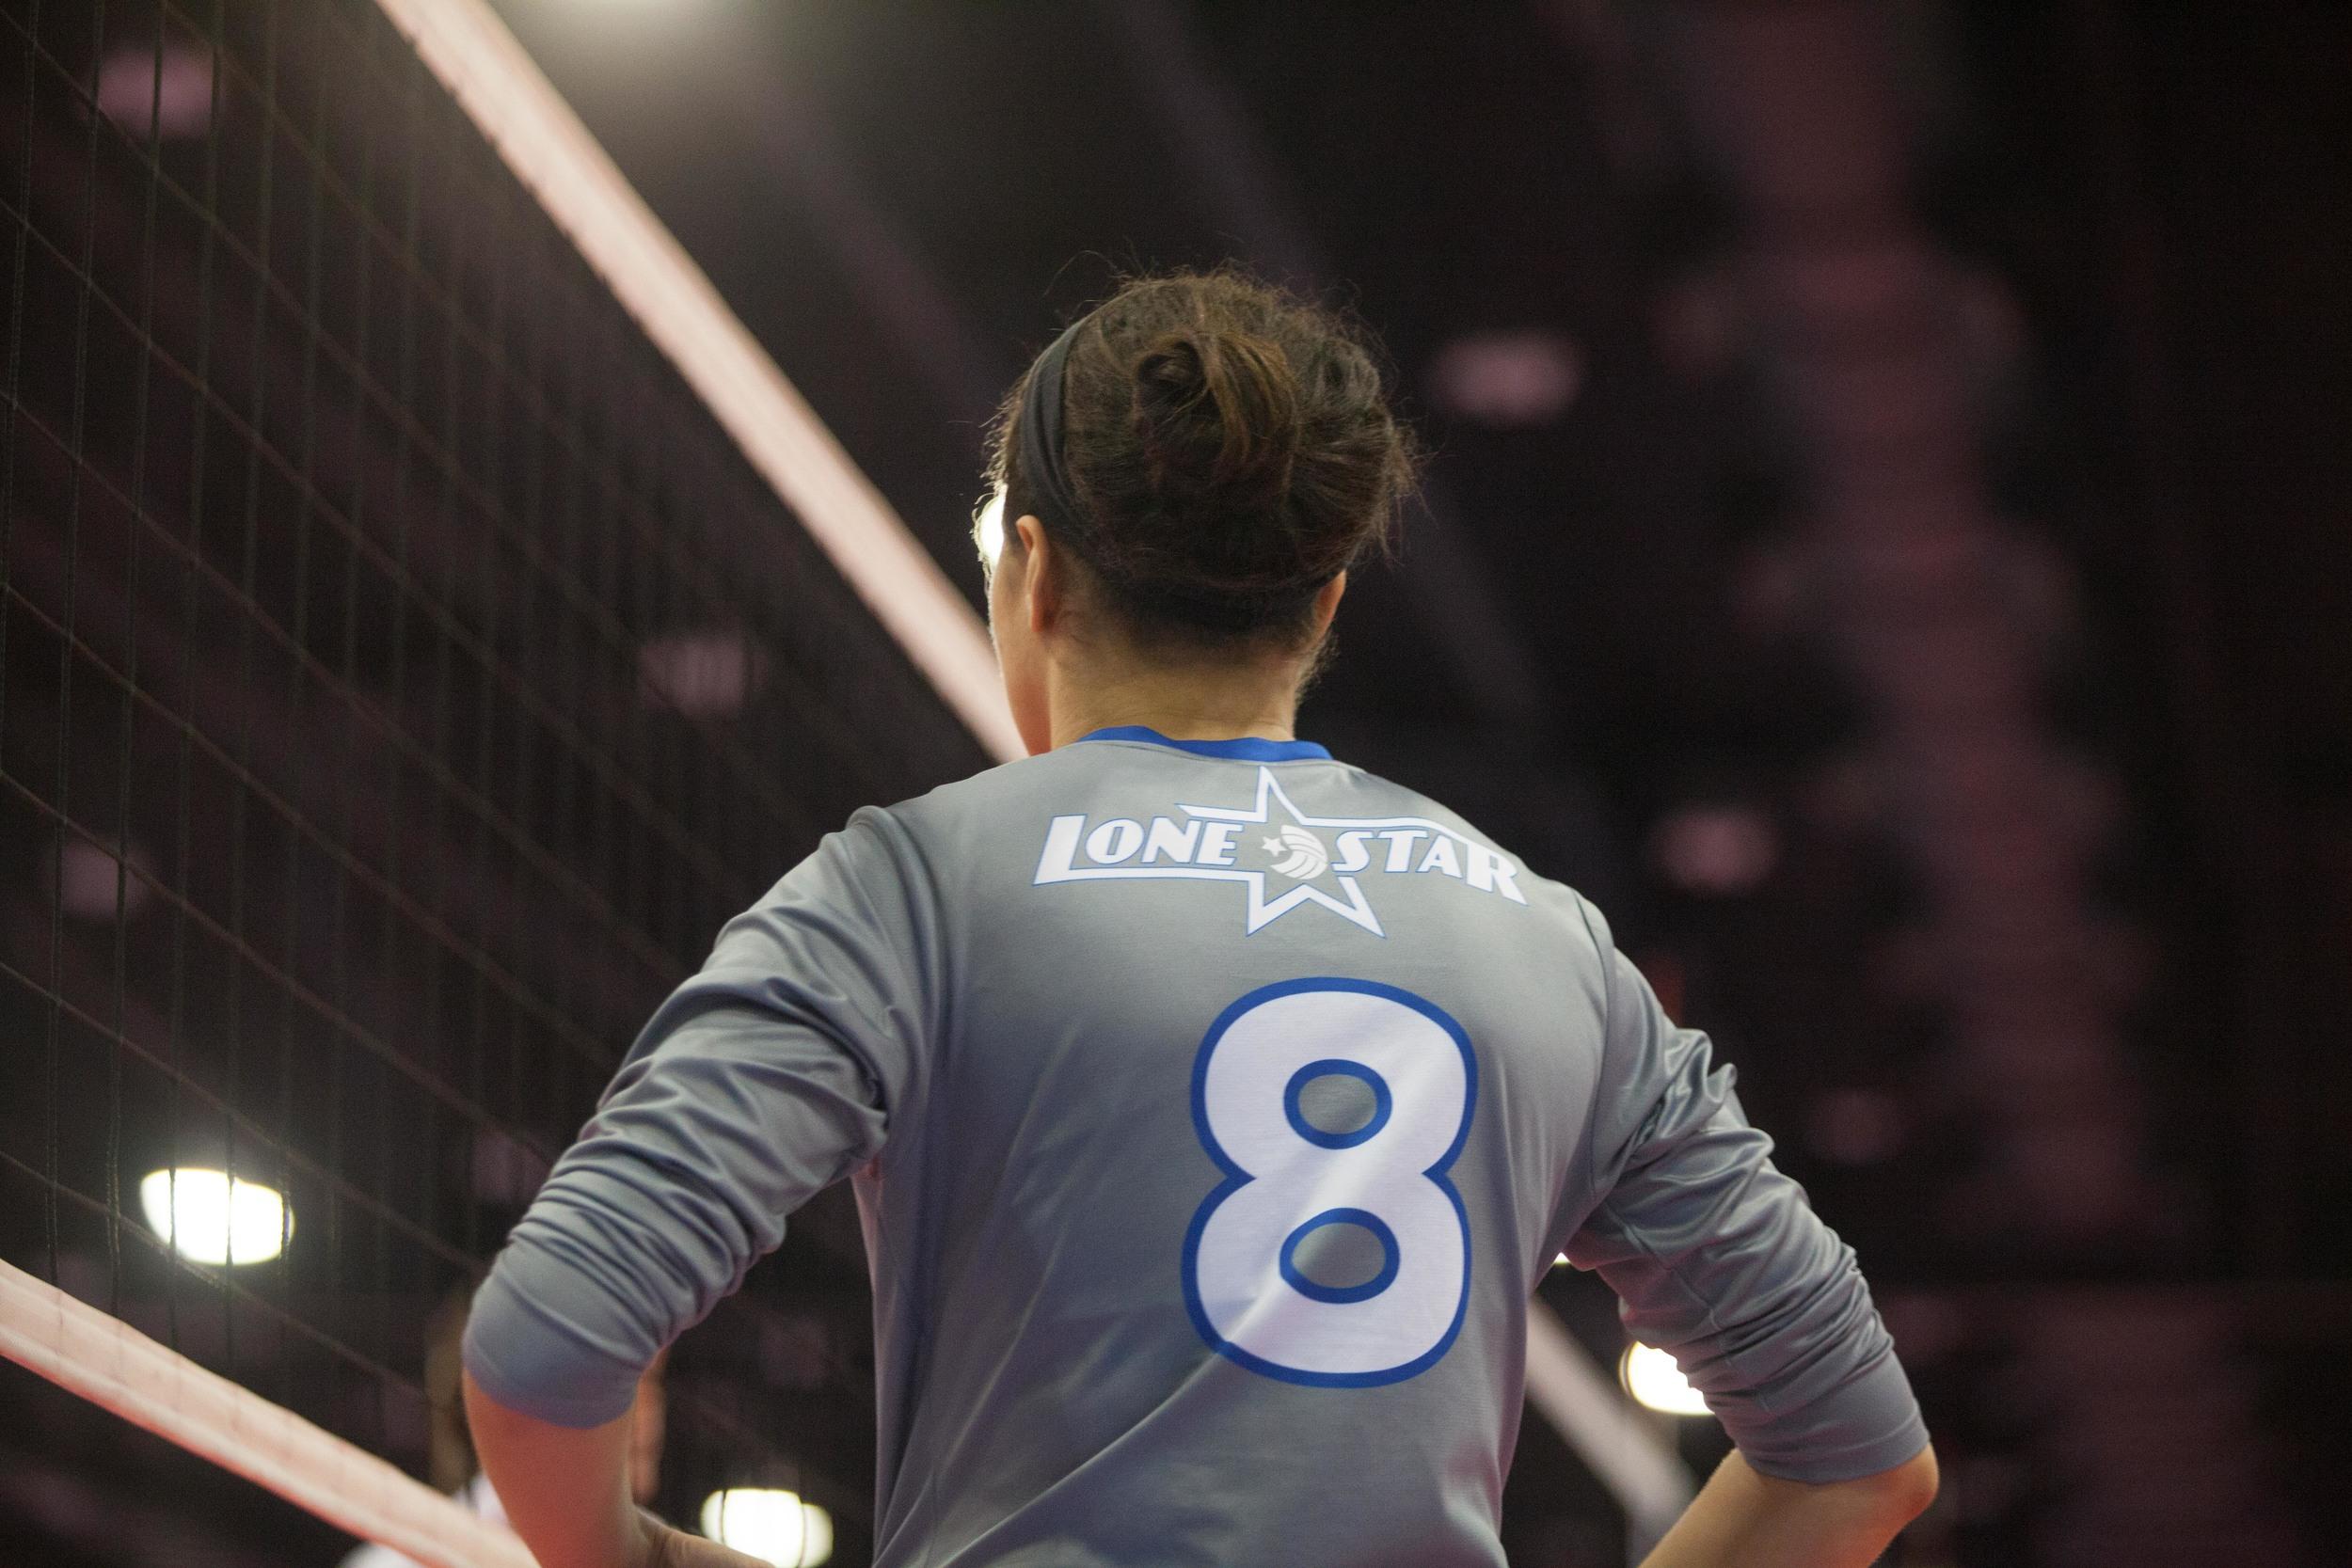 Lonestar Texas Club Volleyball